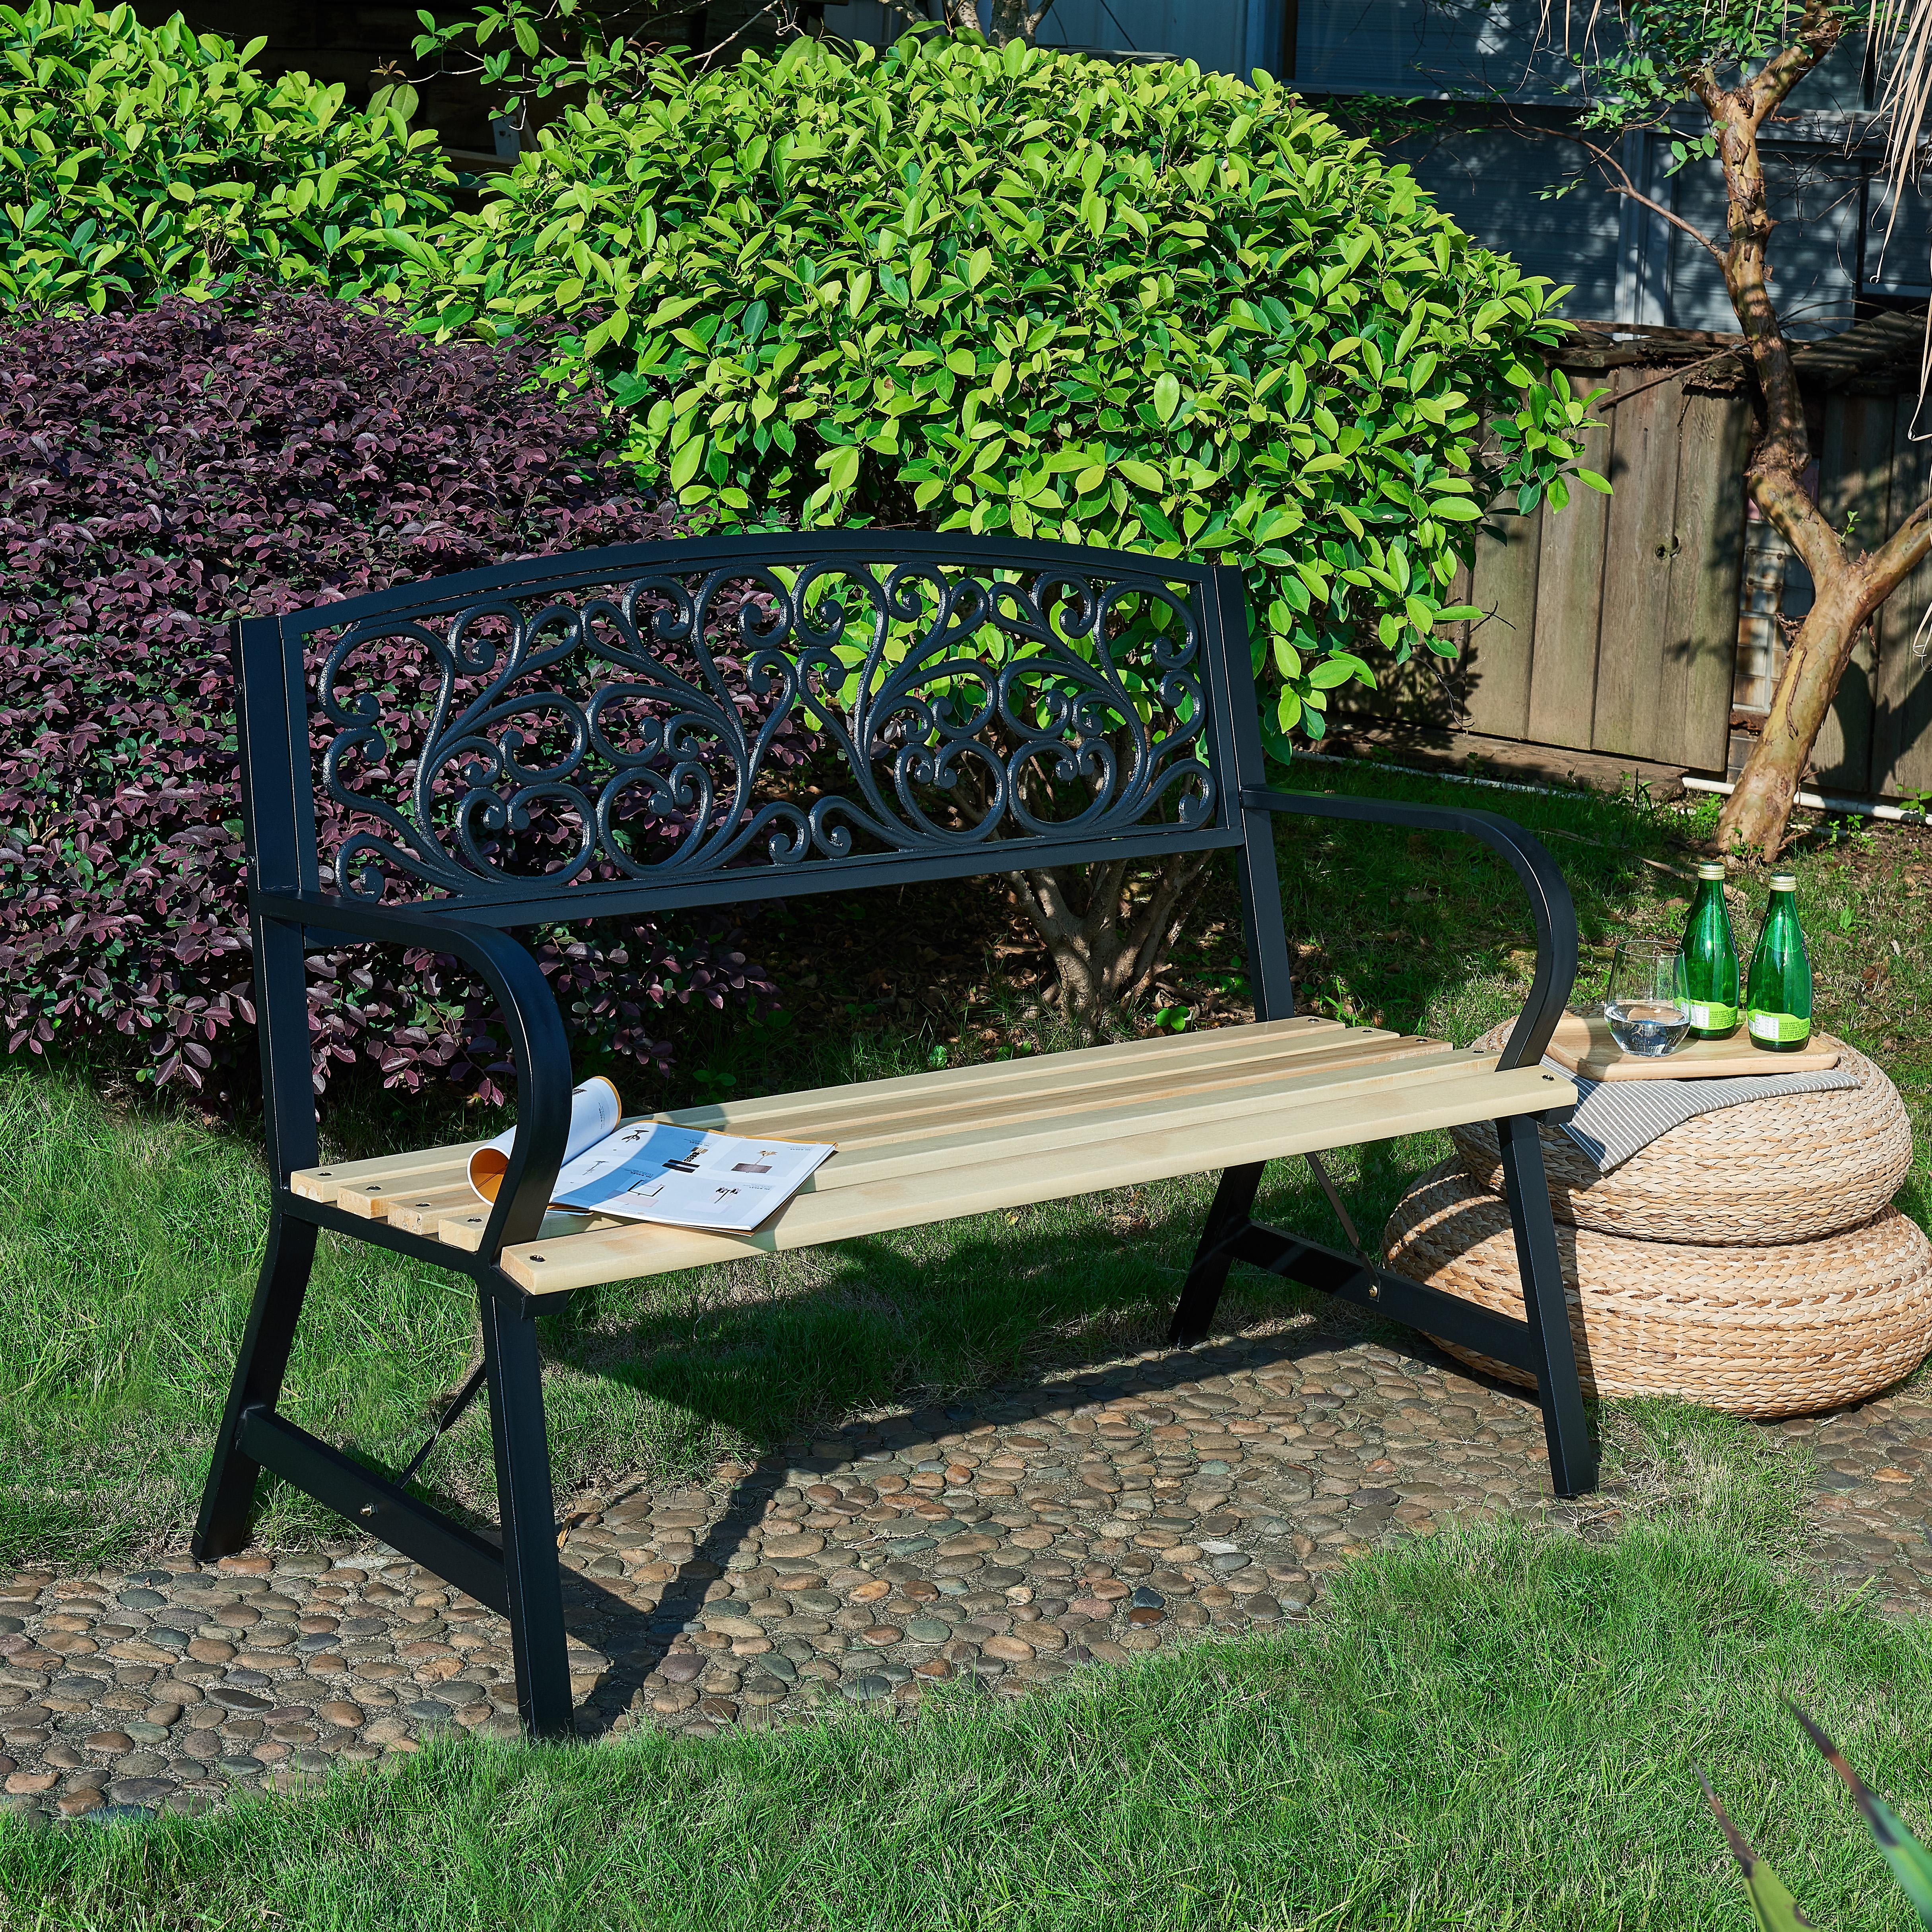 3 Seater Cast Iron Garden Outdoor W Floral Design Back Park Bench